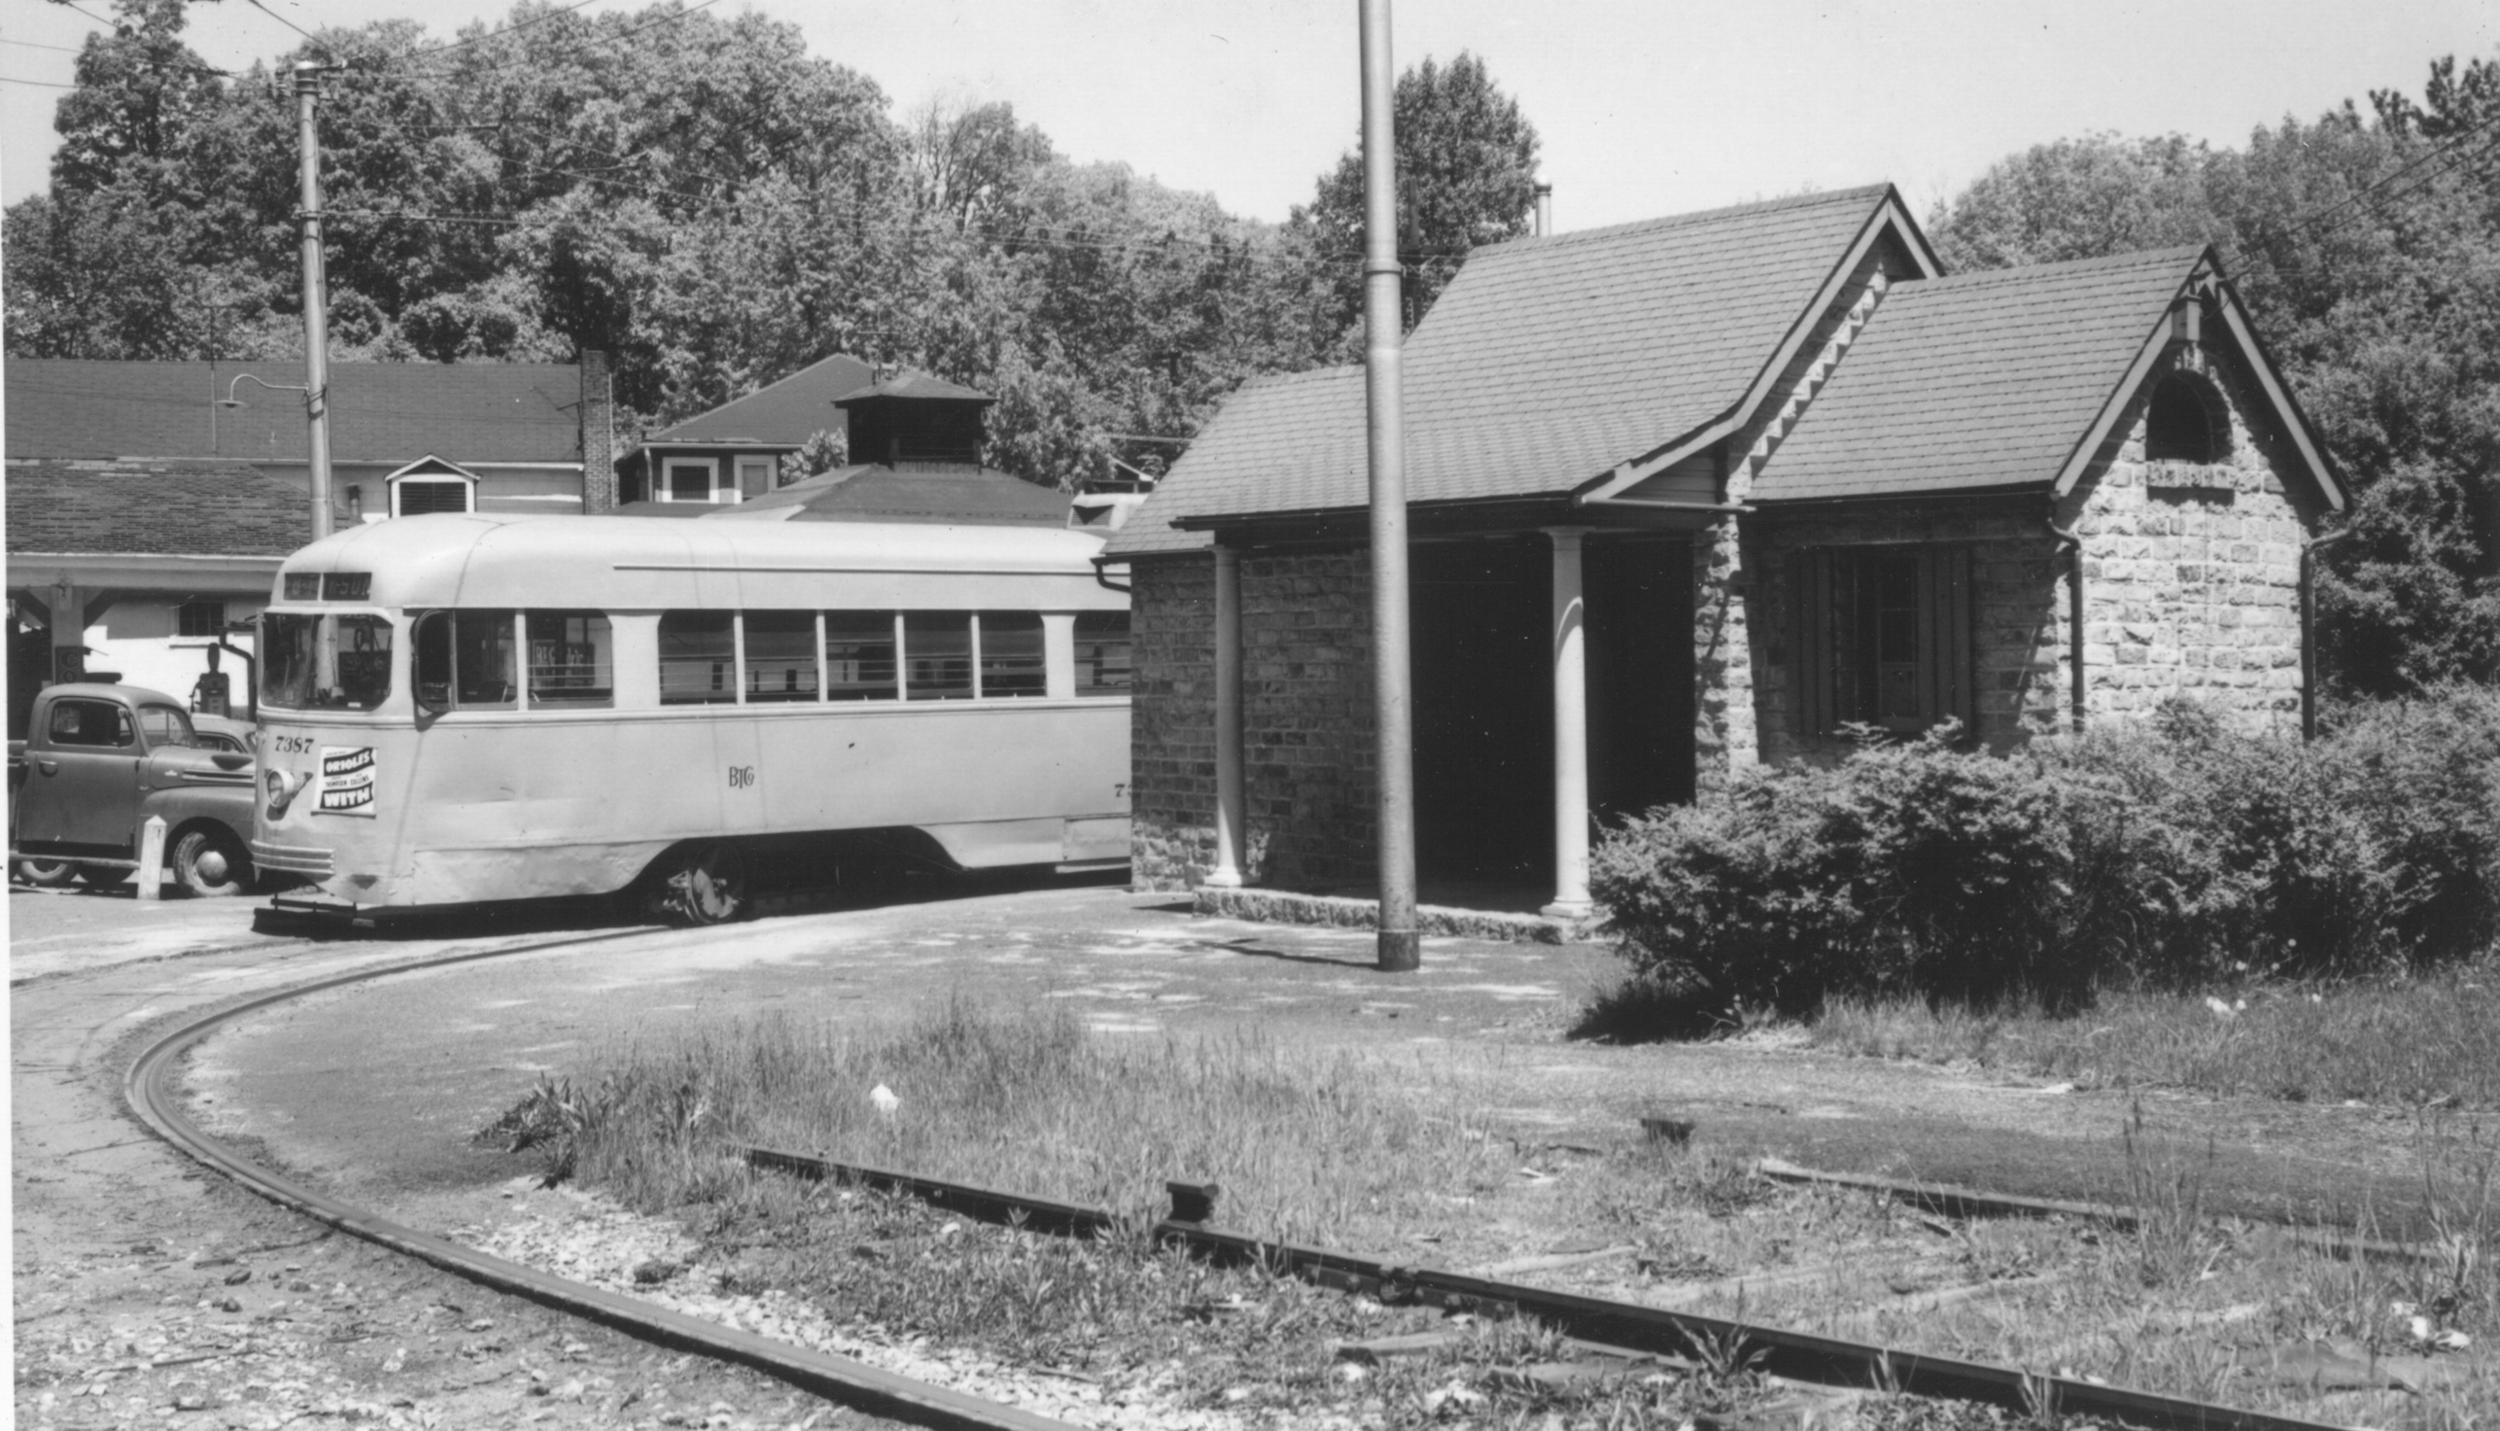 Image Credit: Ed Miller, Catonsville Junction, 1950